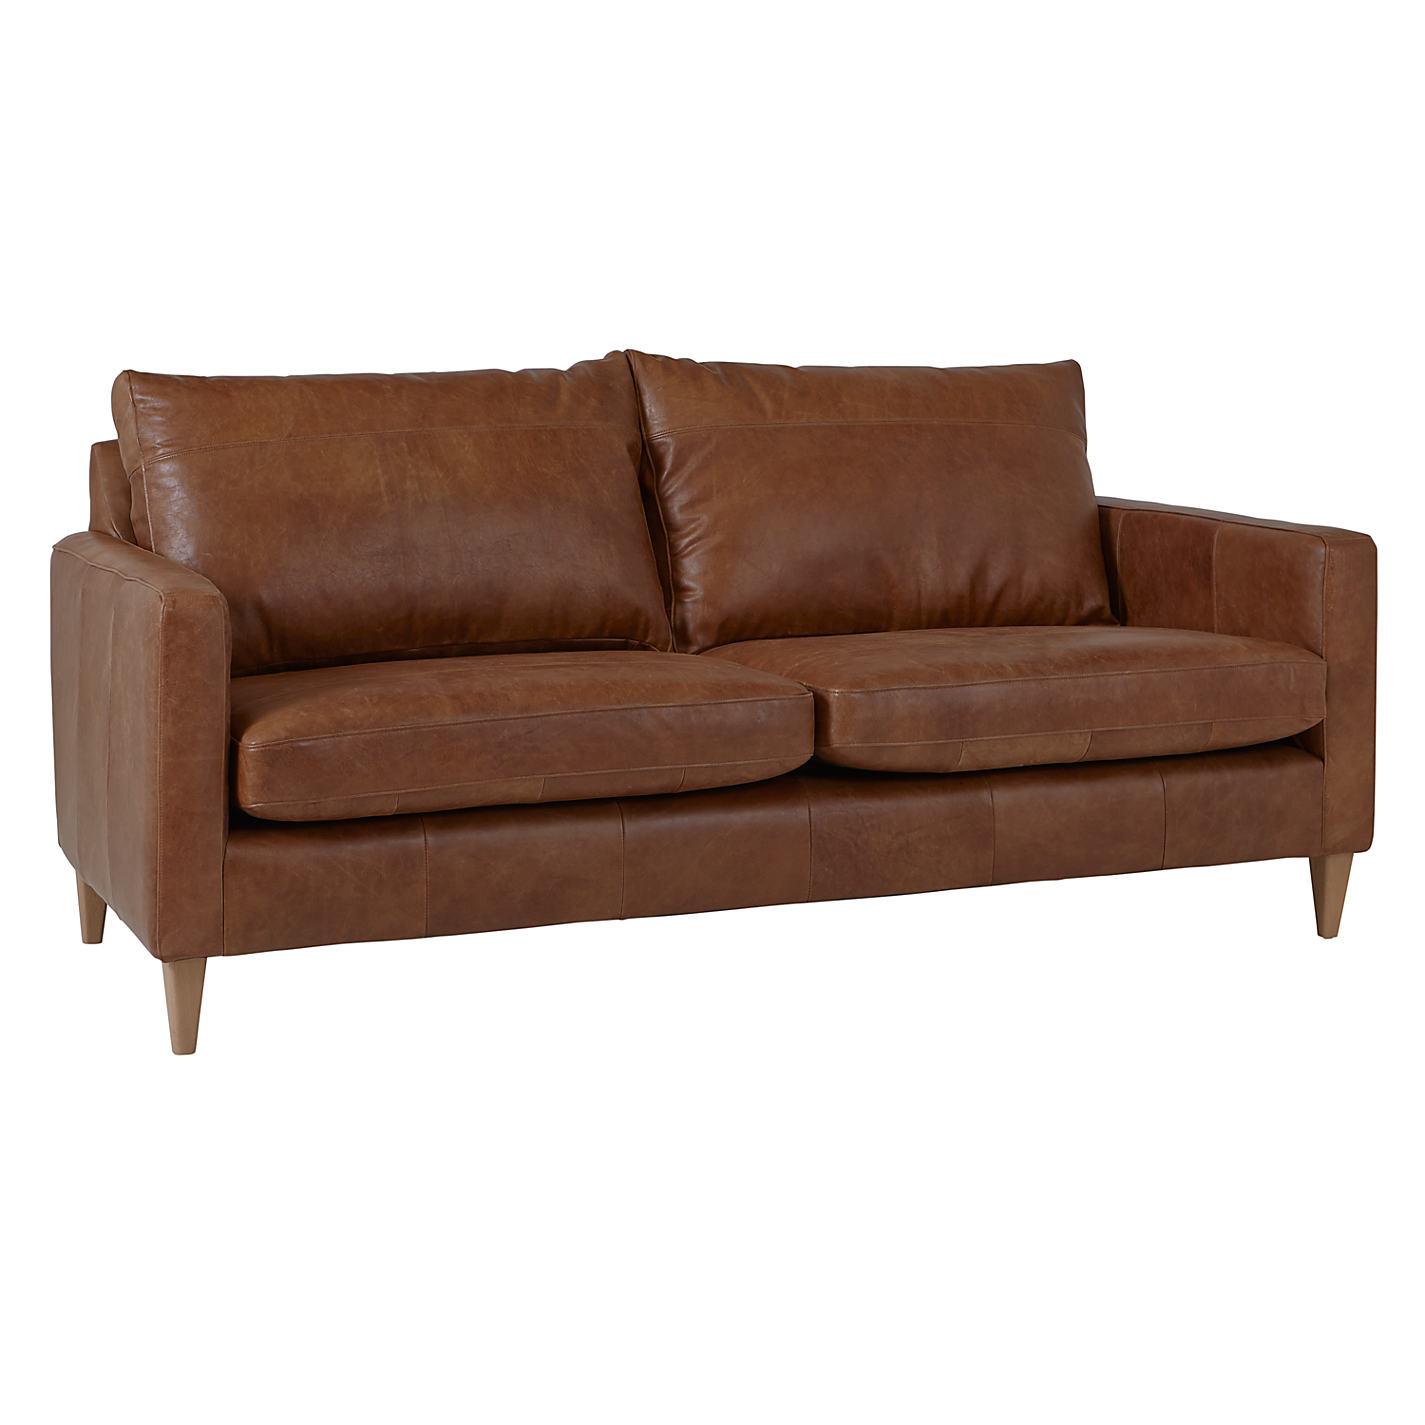 John Lewis Bailey Medium 2 Seater Semi-Aniline Leather Sofa, Lustre  Cappuccino